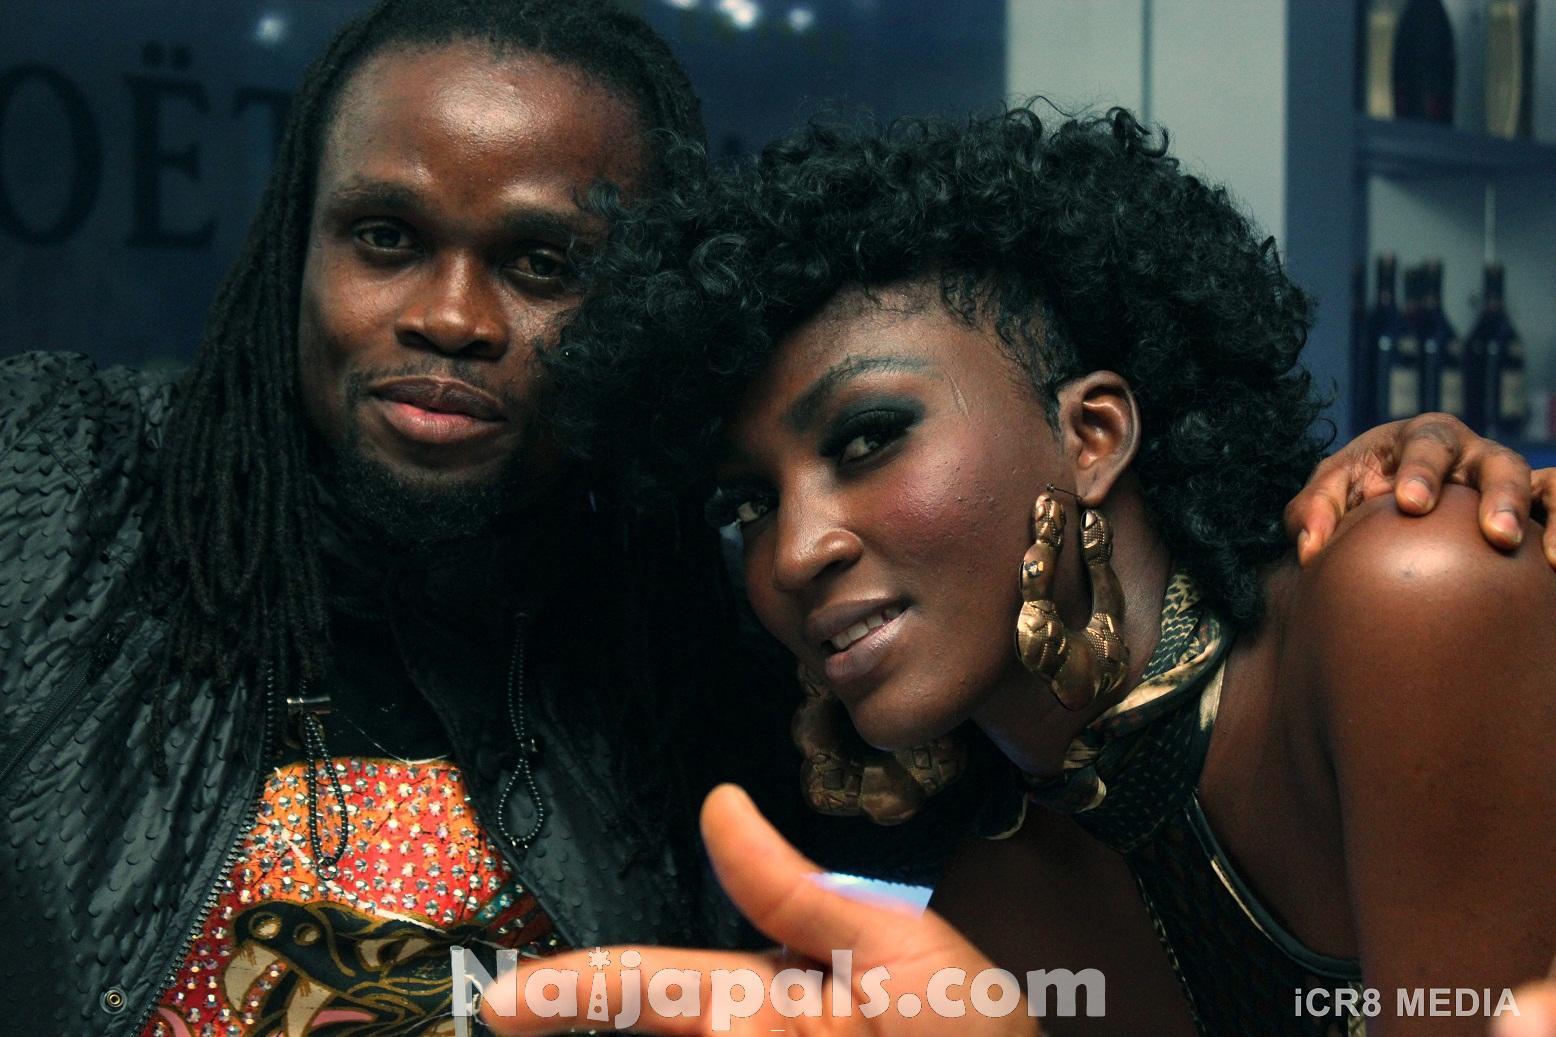 M.I Abaga Illegal Music launch 37